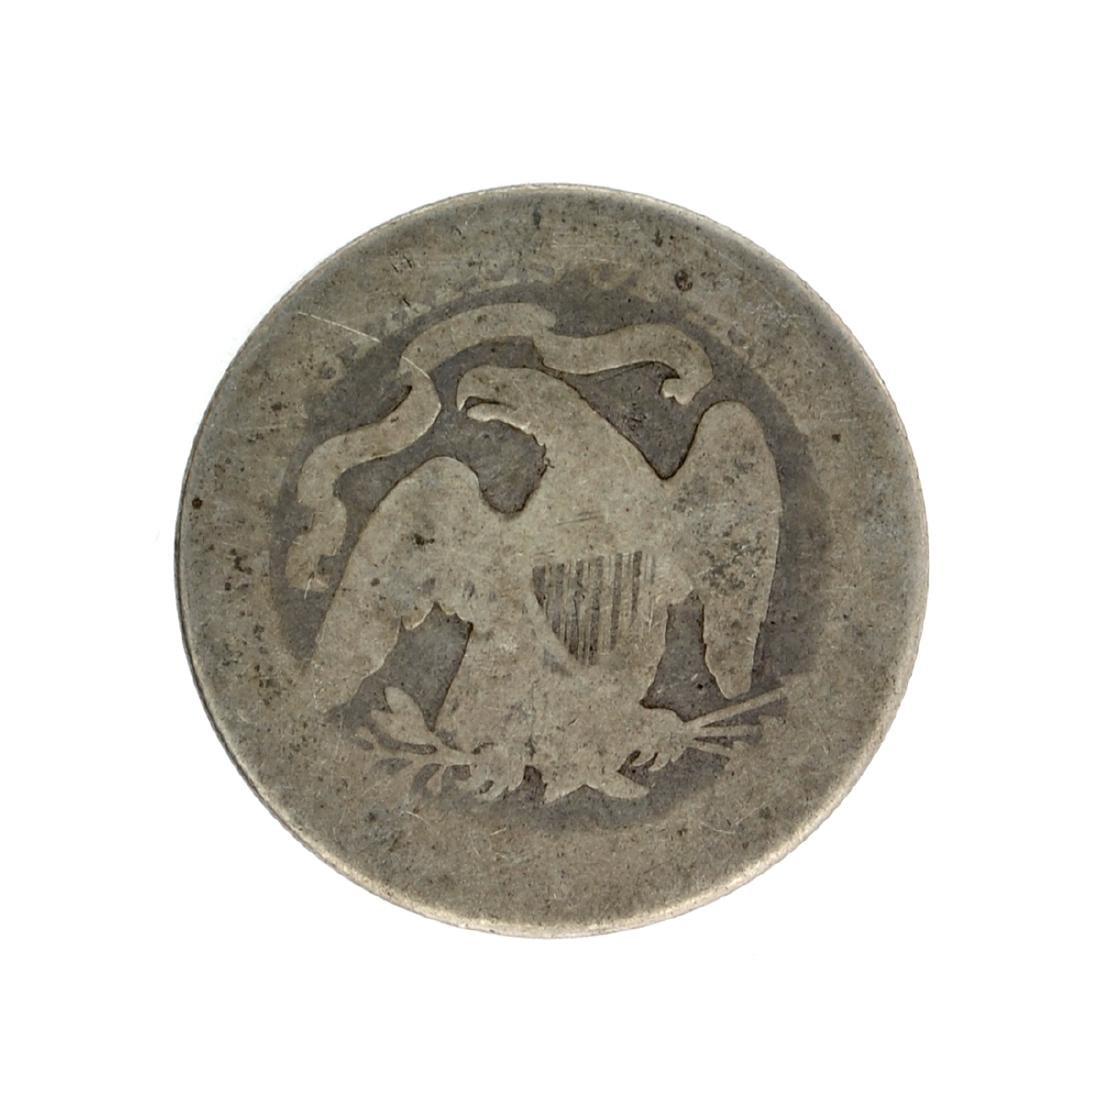 1877 Liberty Seated Quarter Dollar Coin - 2